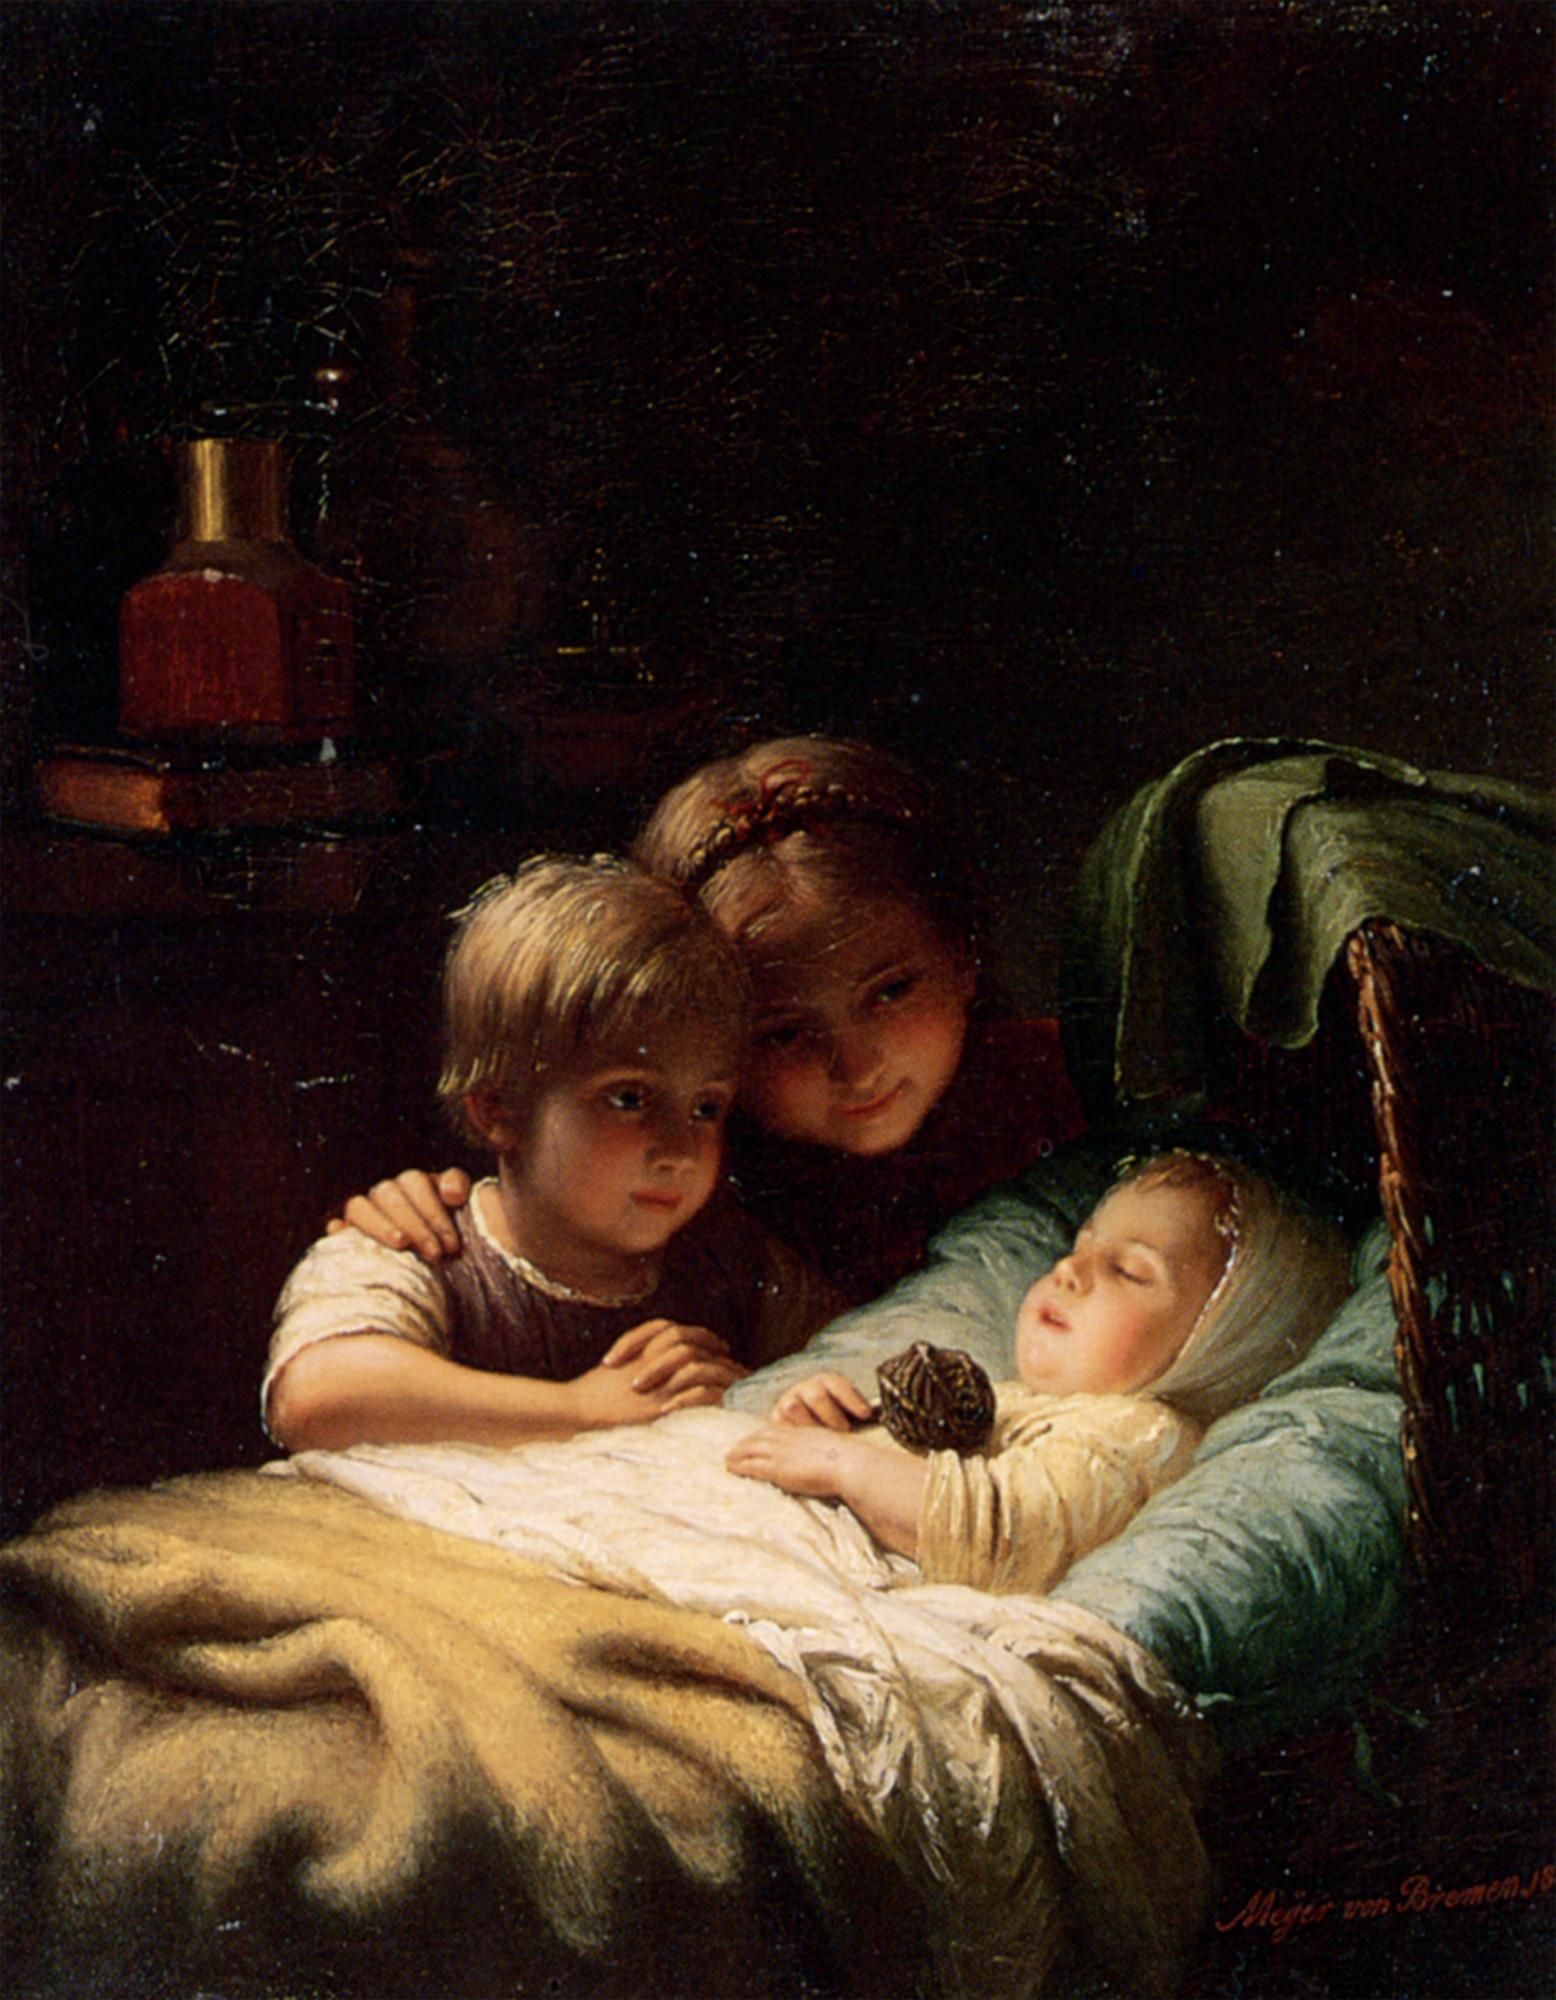 The younger brother :: Johann Georg Meyer von Bremen - Children's portrait in art and painting ôîòî